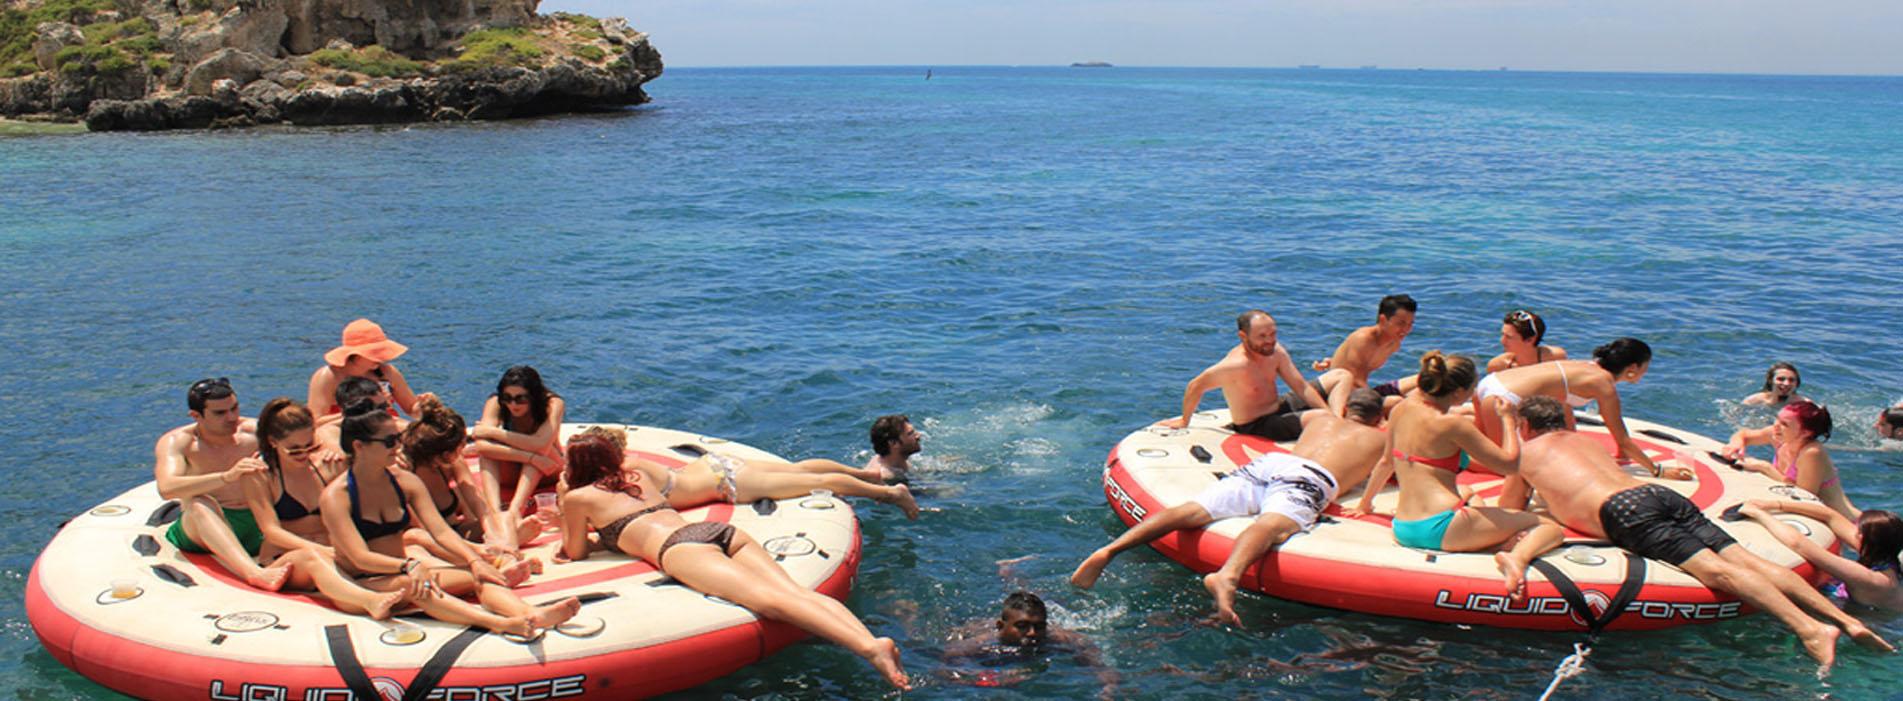 CARNAC ISLAND BOAT CHARTERS people on floaties